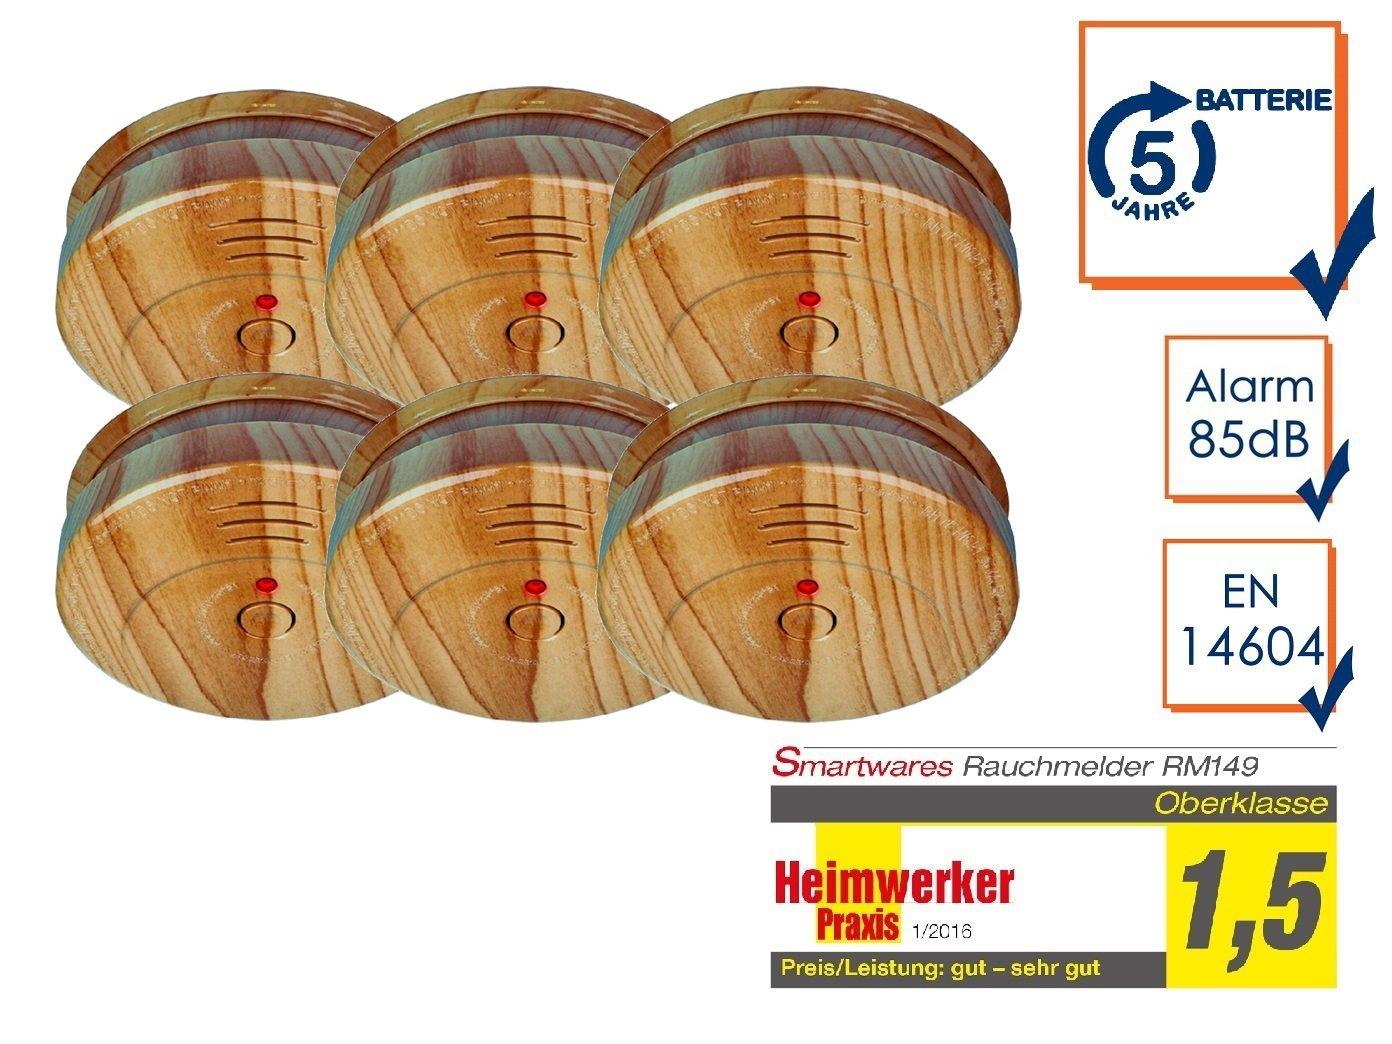 Smartwares 5-Jahres Rauchwarn-// Brandmelder holzoptik RM149H-5 DIN EN14604